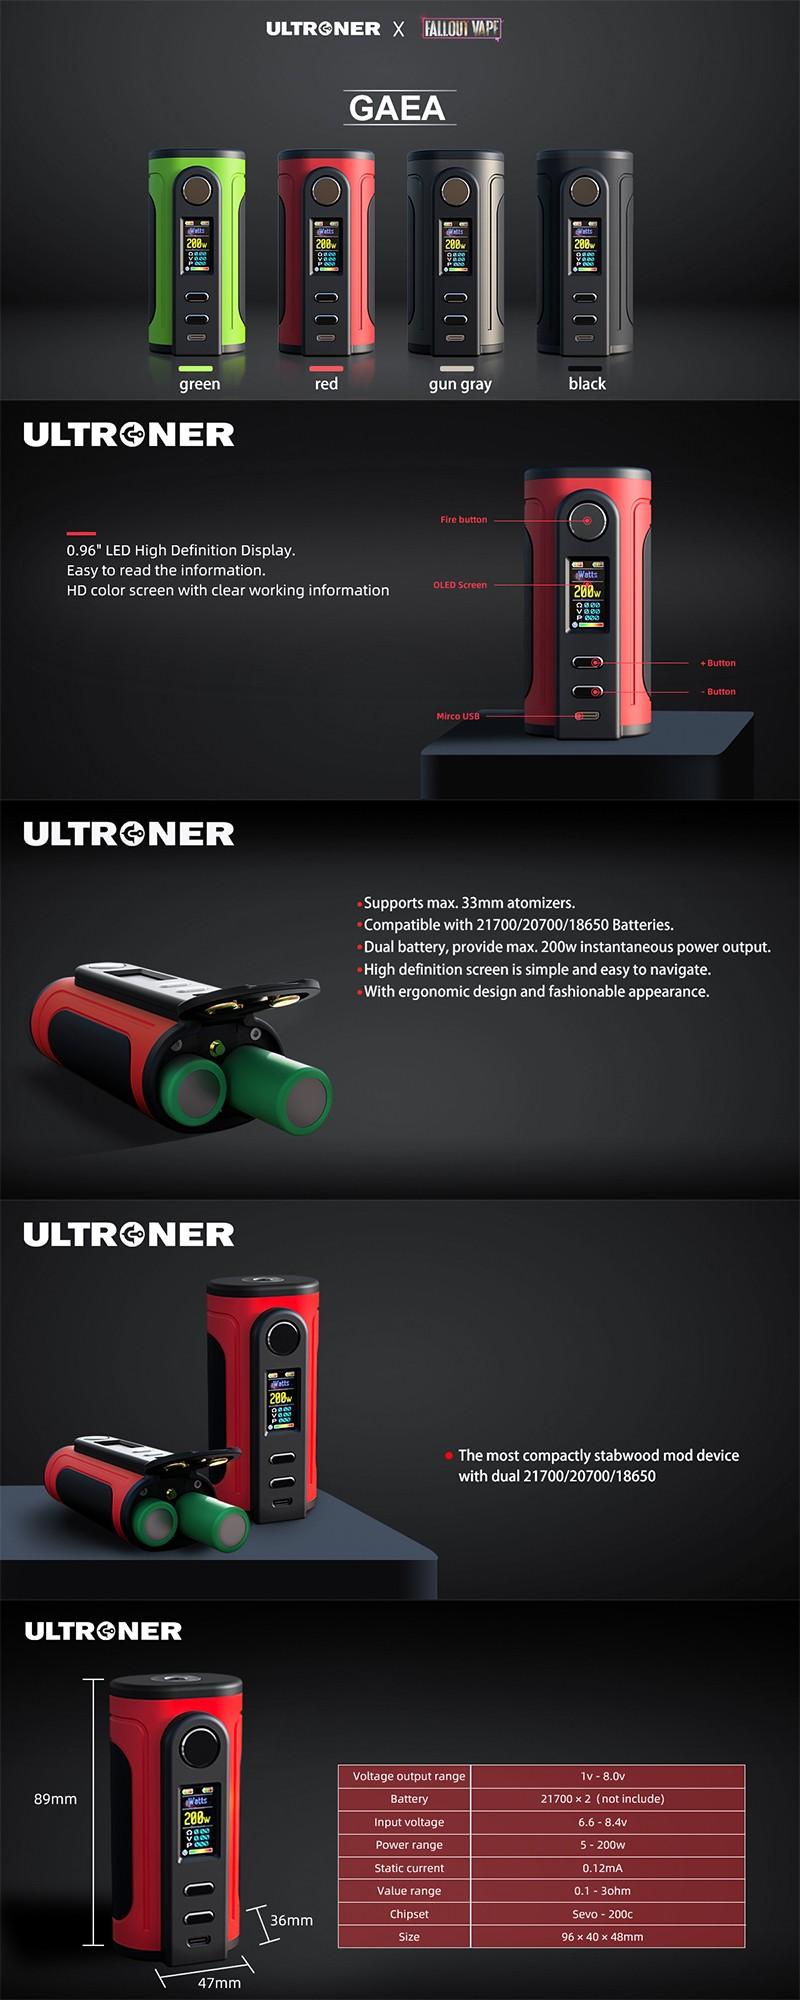 Authentic Ultroner x Fallout Vape Gaea 200W Vape Box Mod